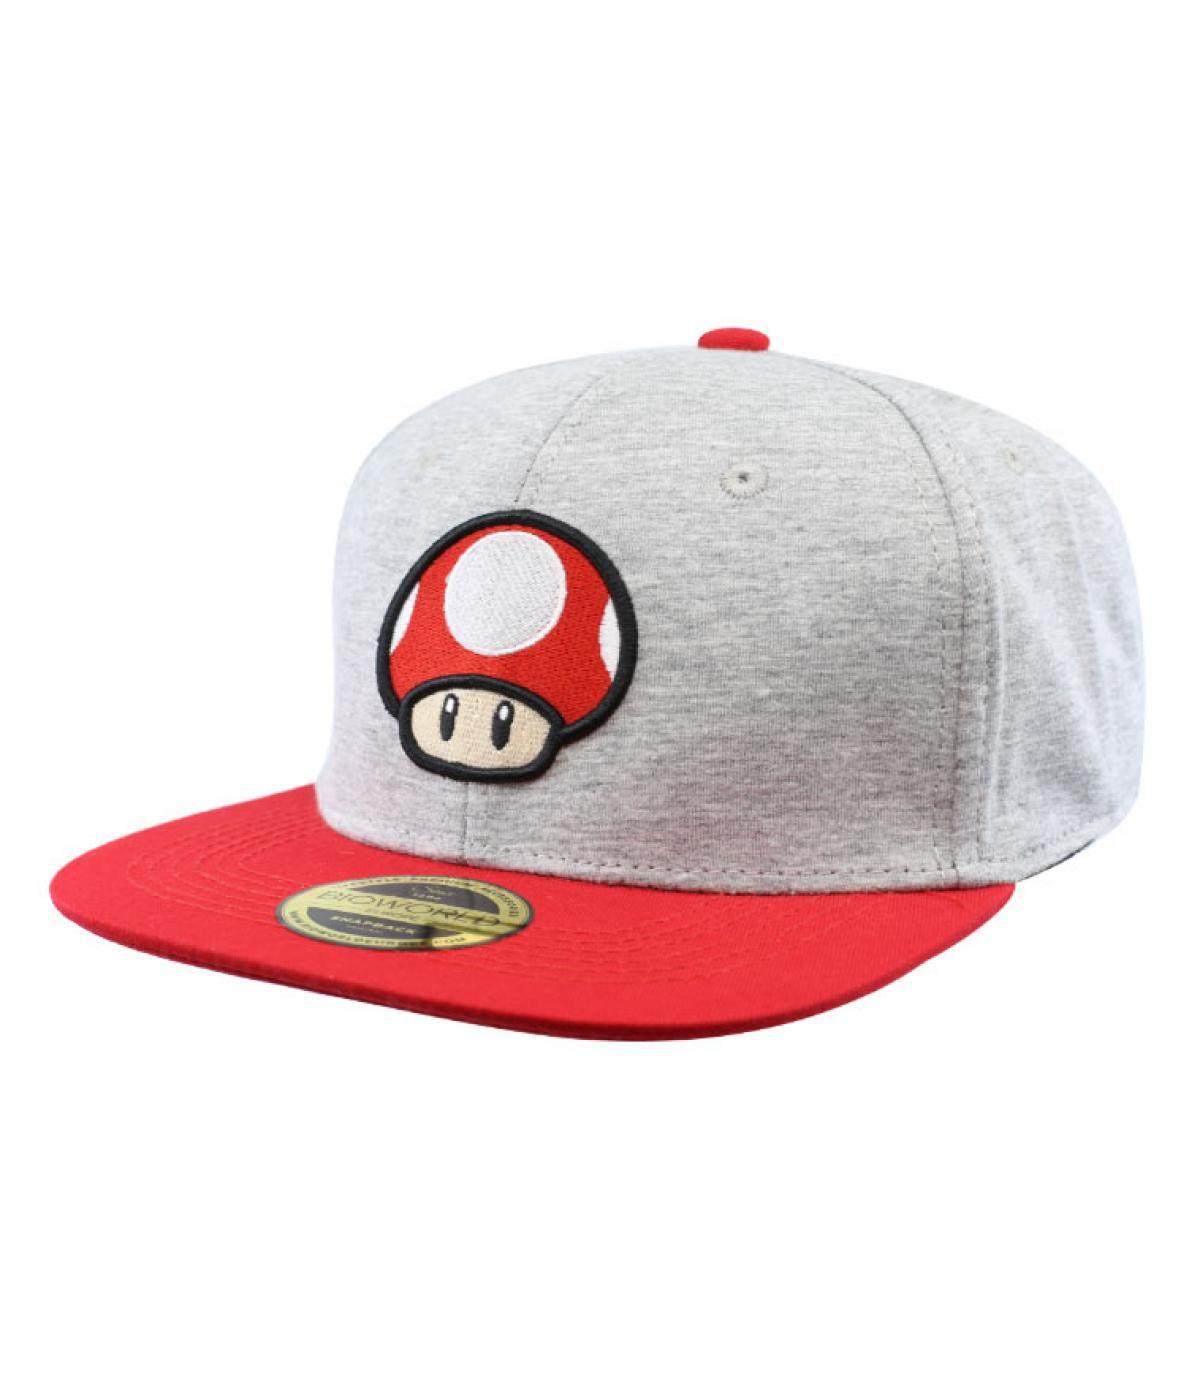 Details Snapback Mushroom Nintendo - Abbildung 2